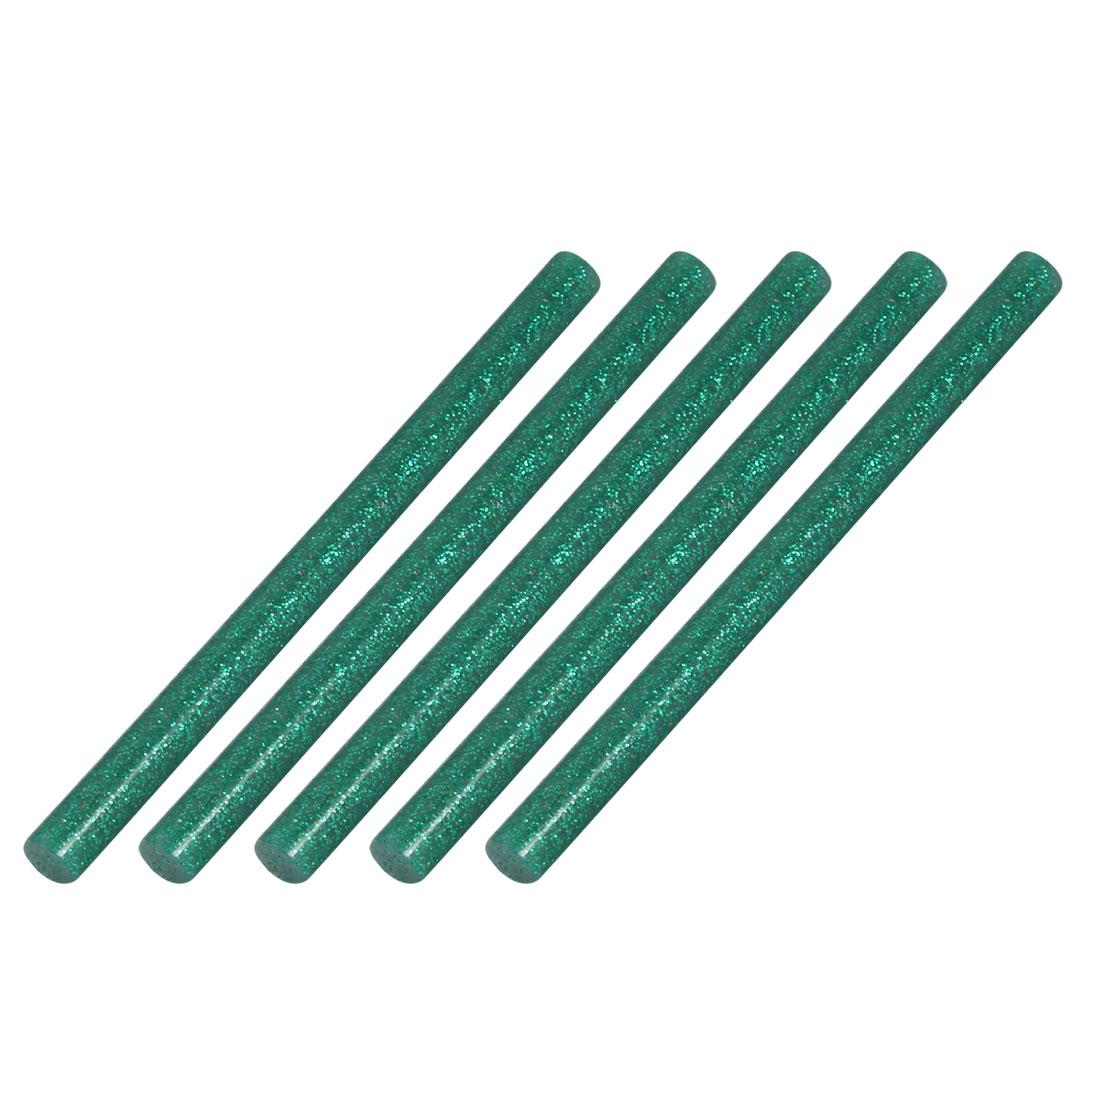 5pcs 7mm Dia 100mm Length Hot Melt Glue Adhesive Stick Blackish Green